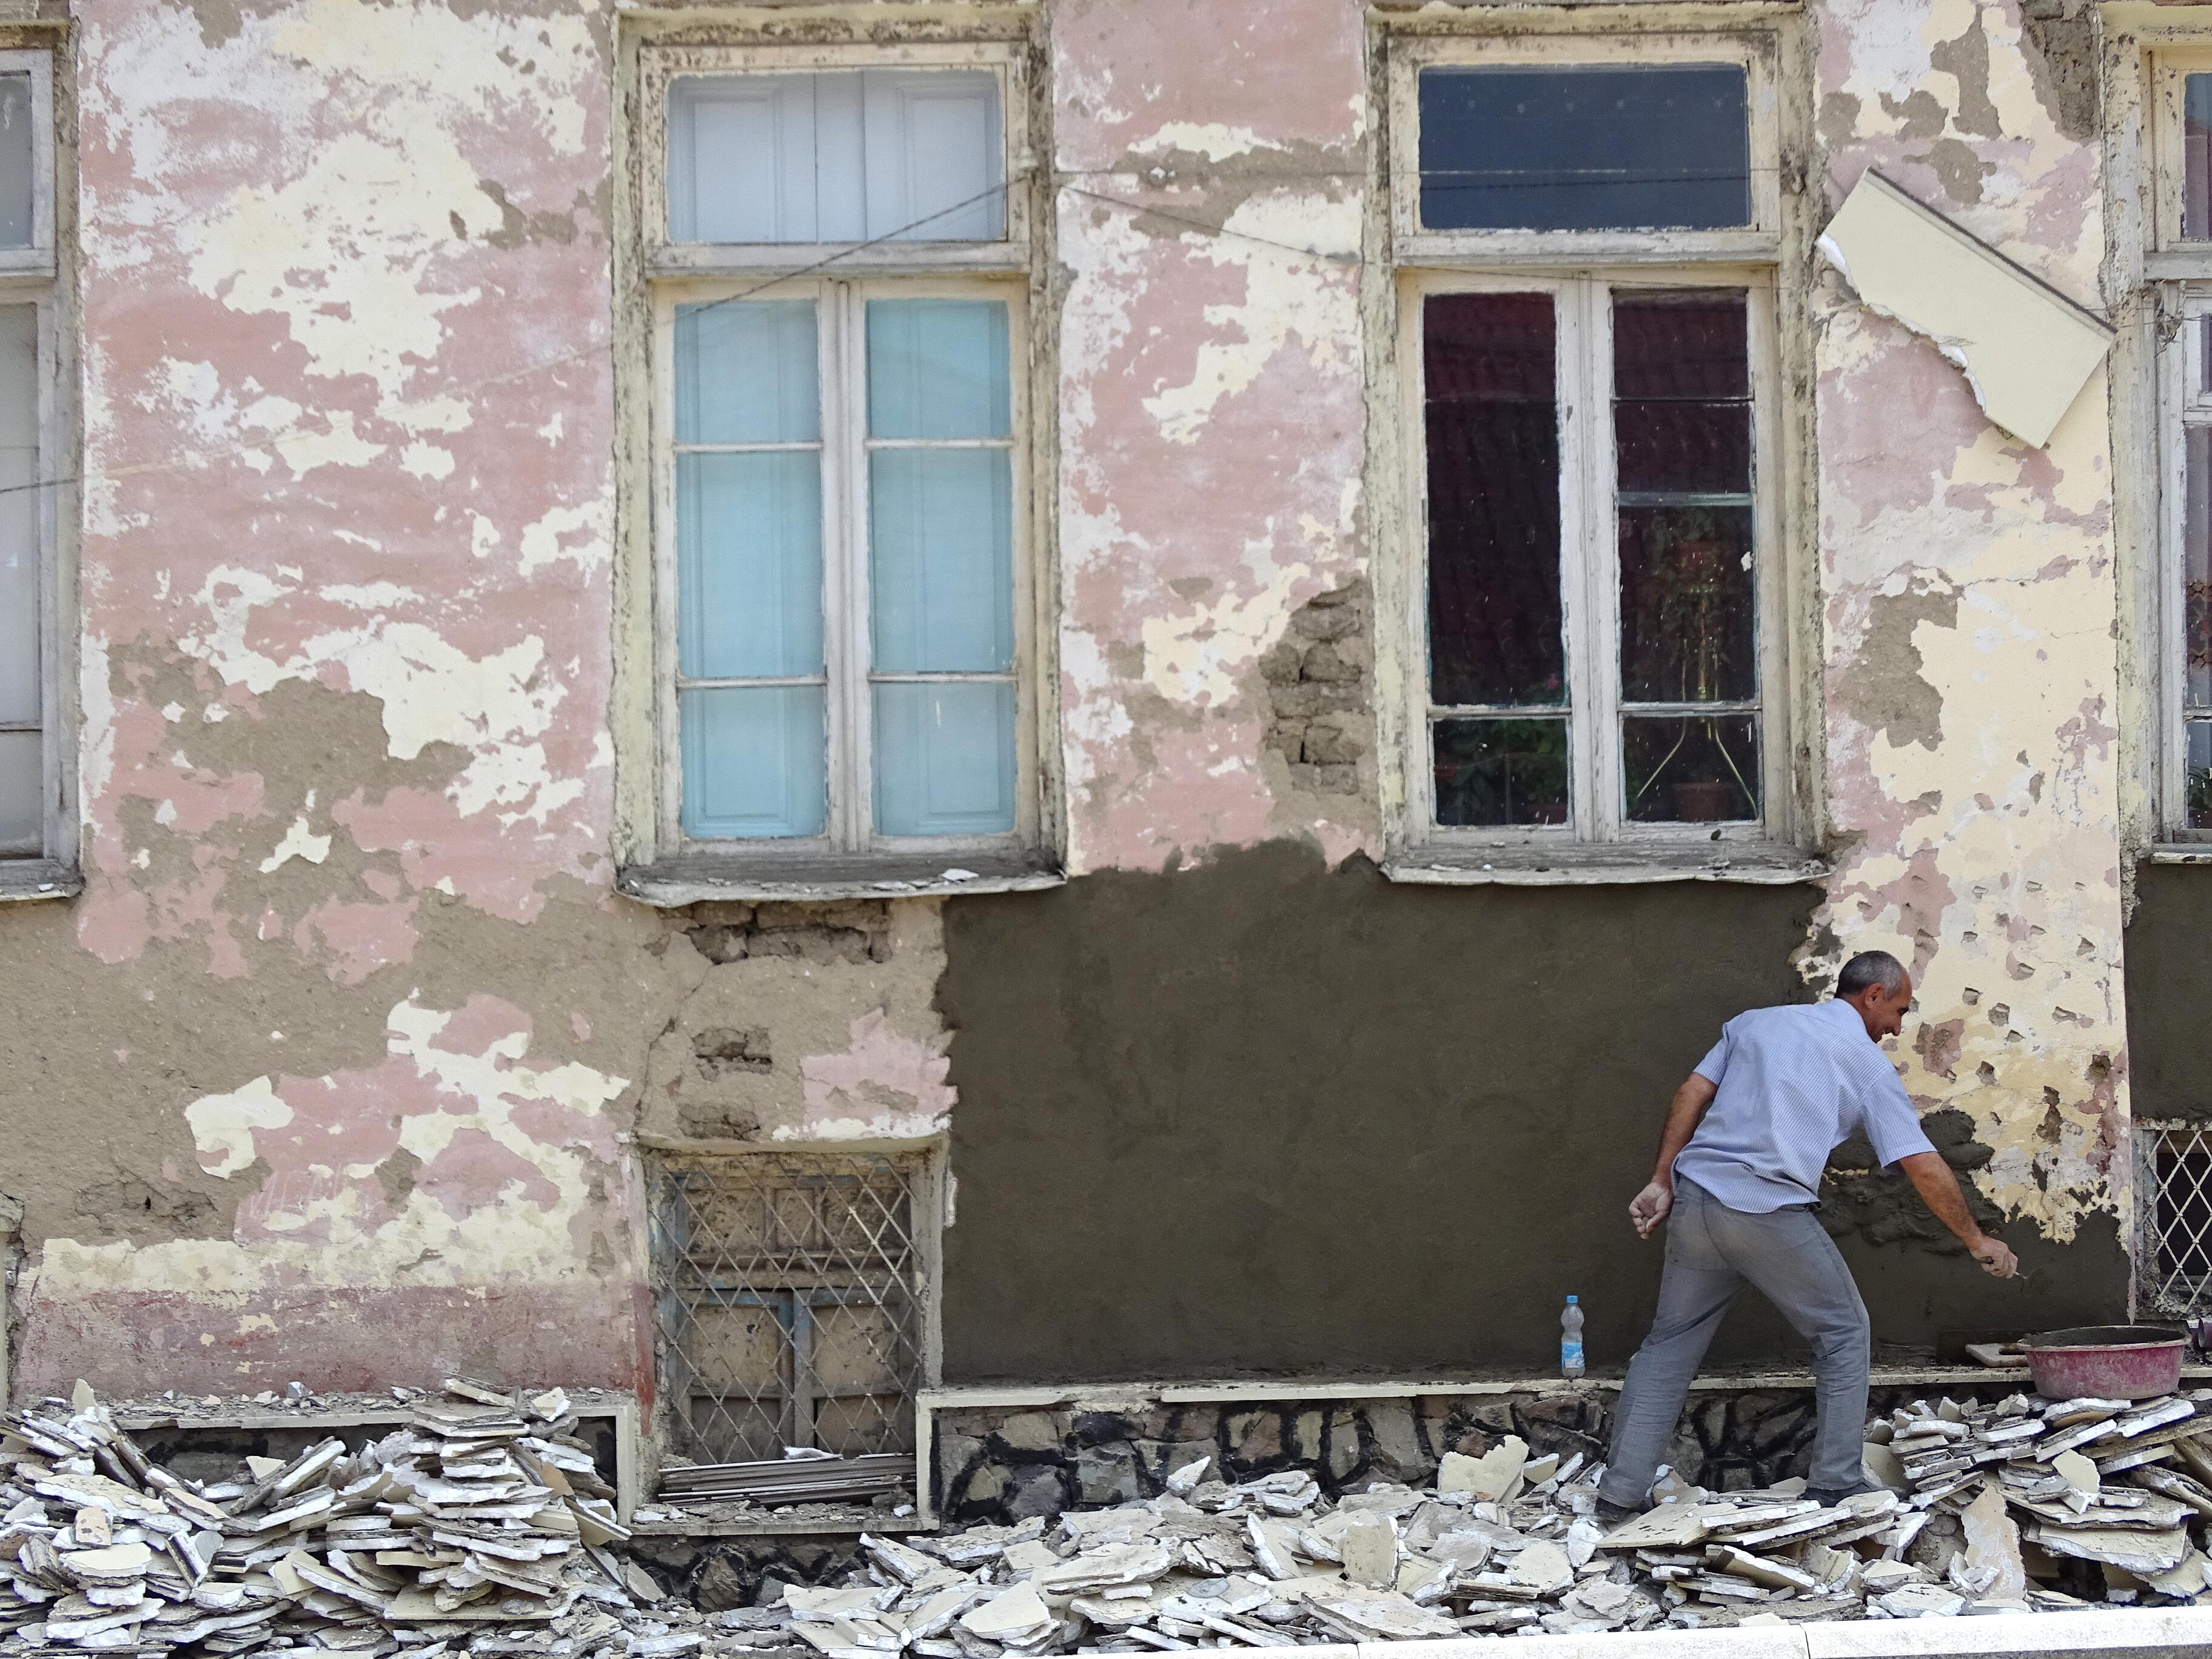 Renovations - Quba - Azerbaijan (18005071021).jpg Renovations - Quba - Azerbaijan Date 23 May 2015, 15:07 Source Renovations - Quba - Azerbaijan